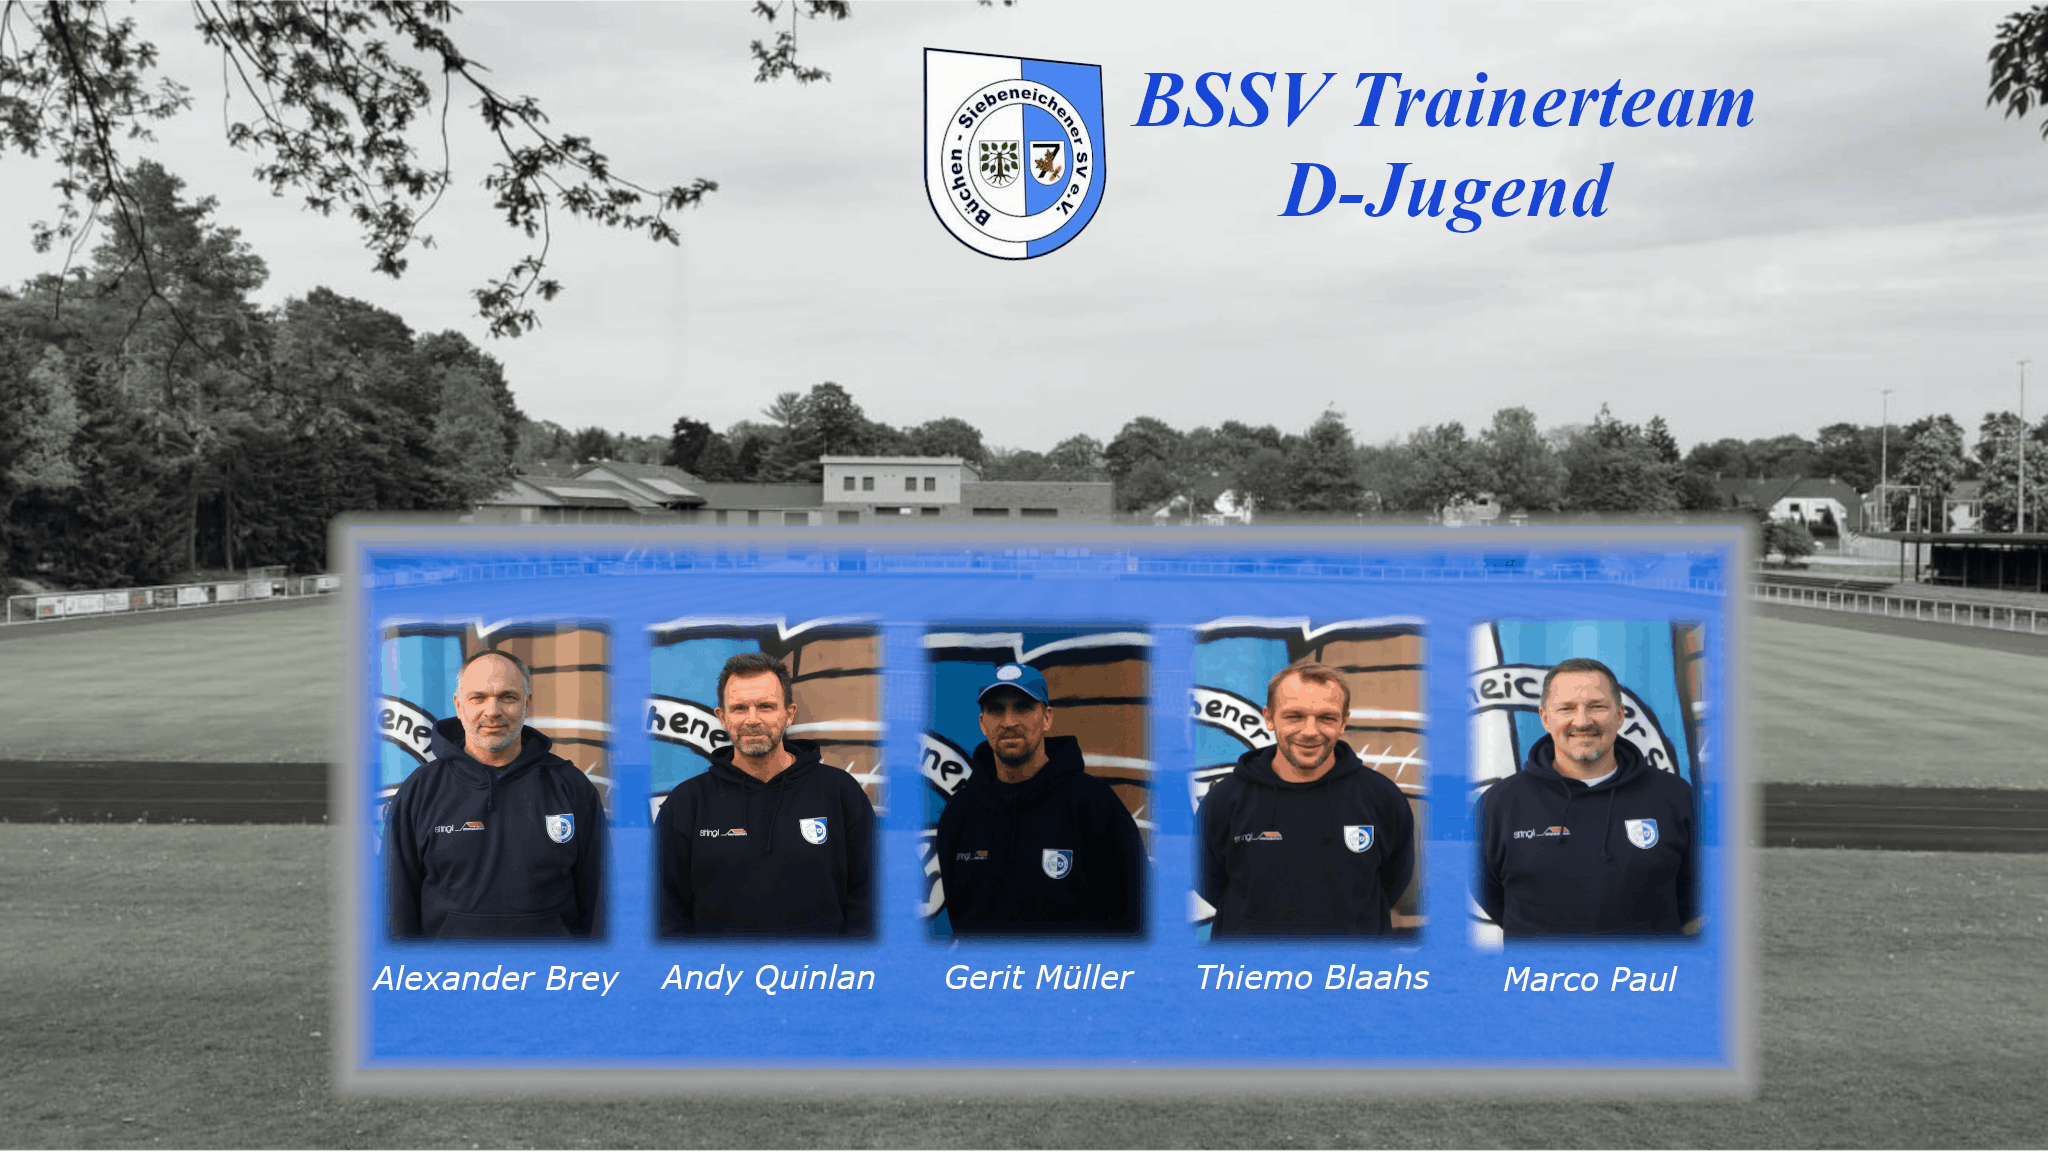 Das Trainerteam der D-Jugend